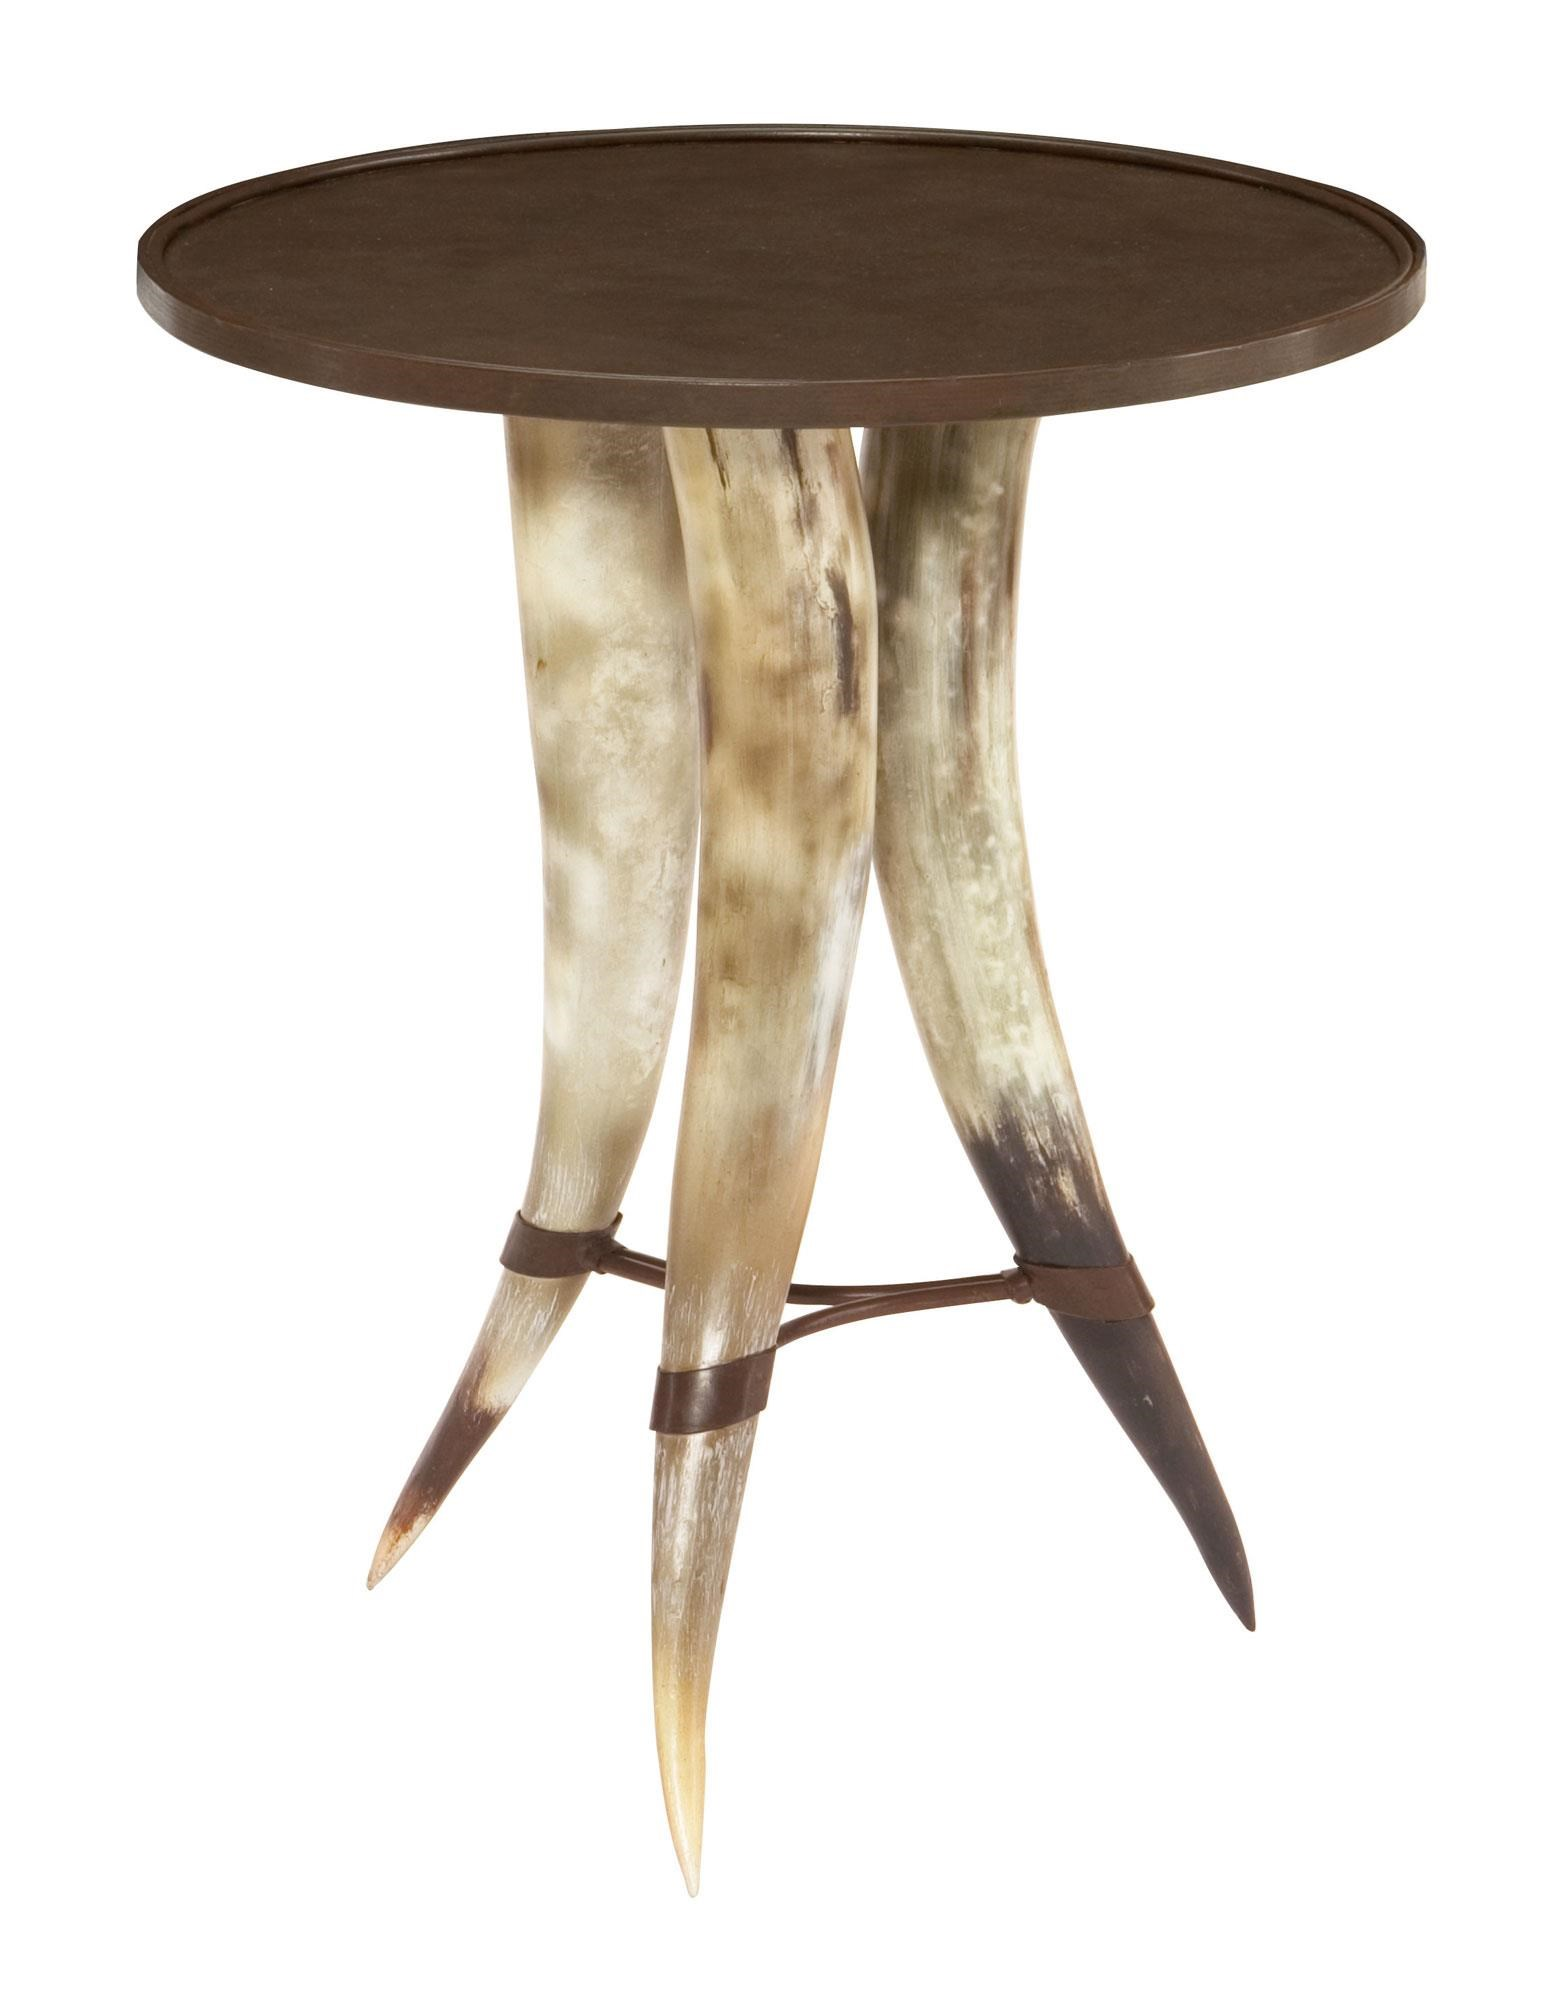 Bernhardt Texas Horn Texas Horn Table - Item Number: 532753667